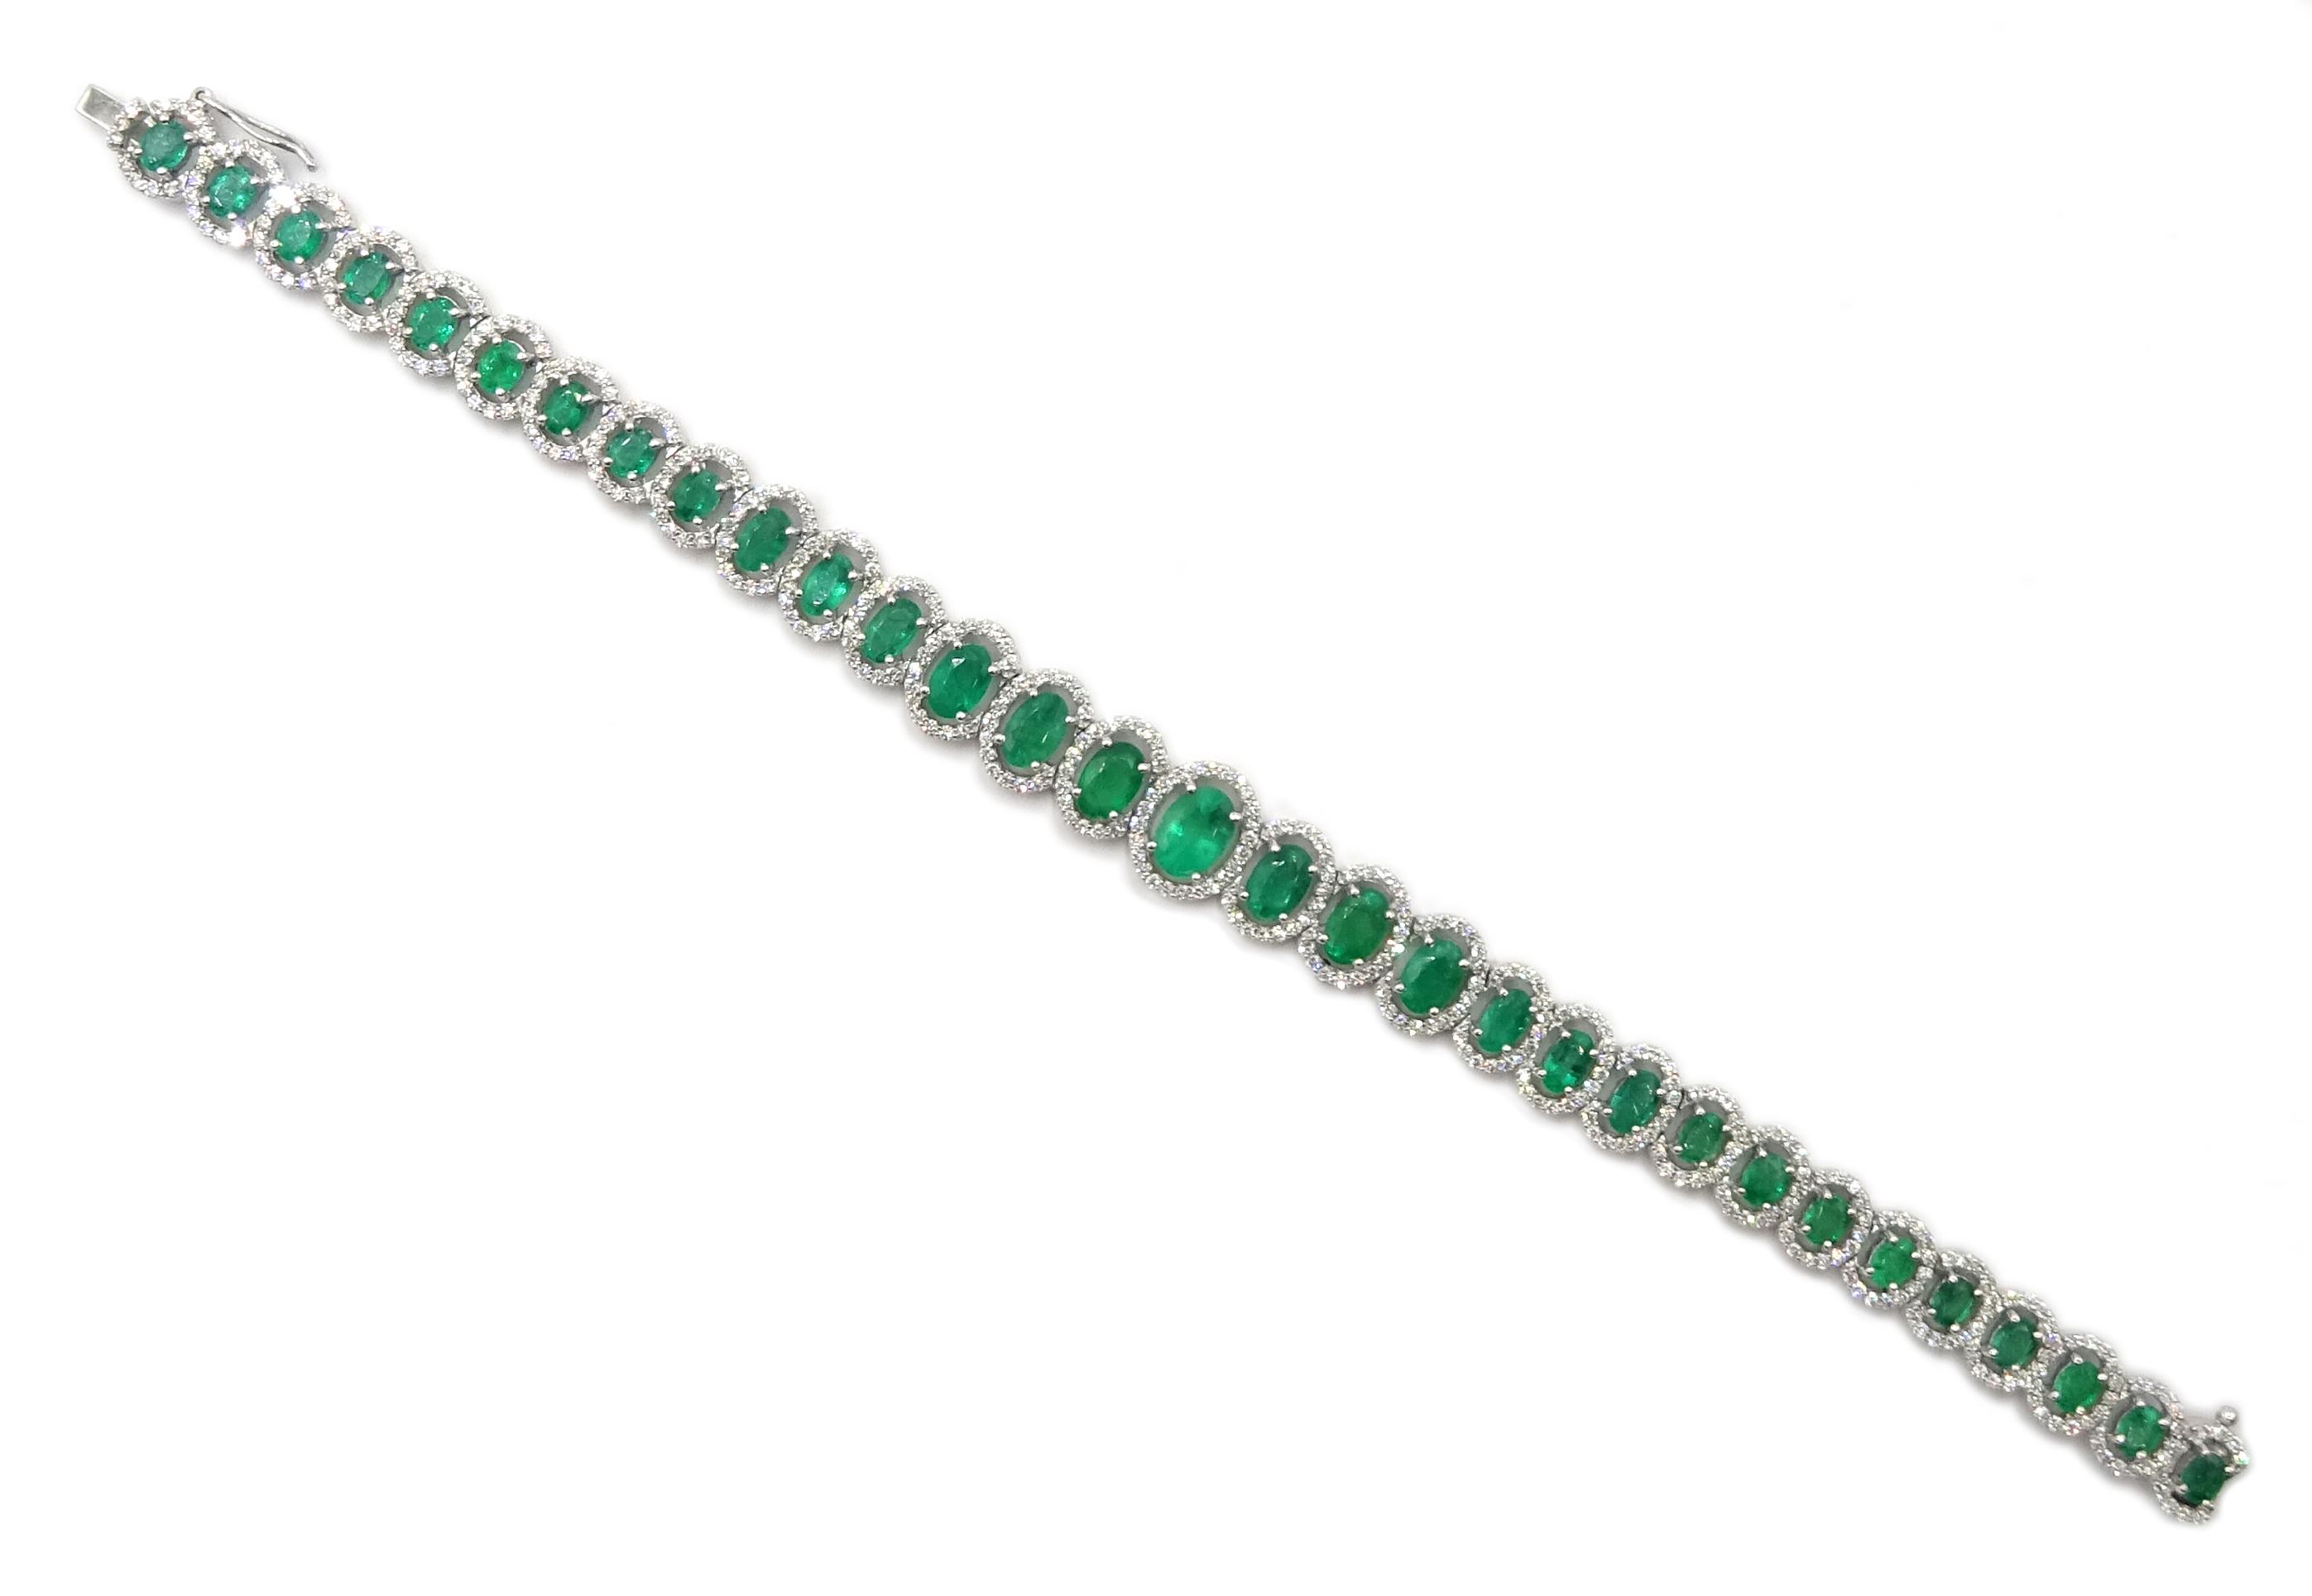 18ct gold graduating oval emerald bracelet - Image 3 of 5